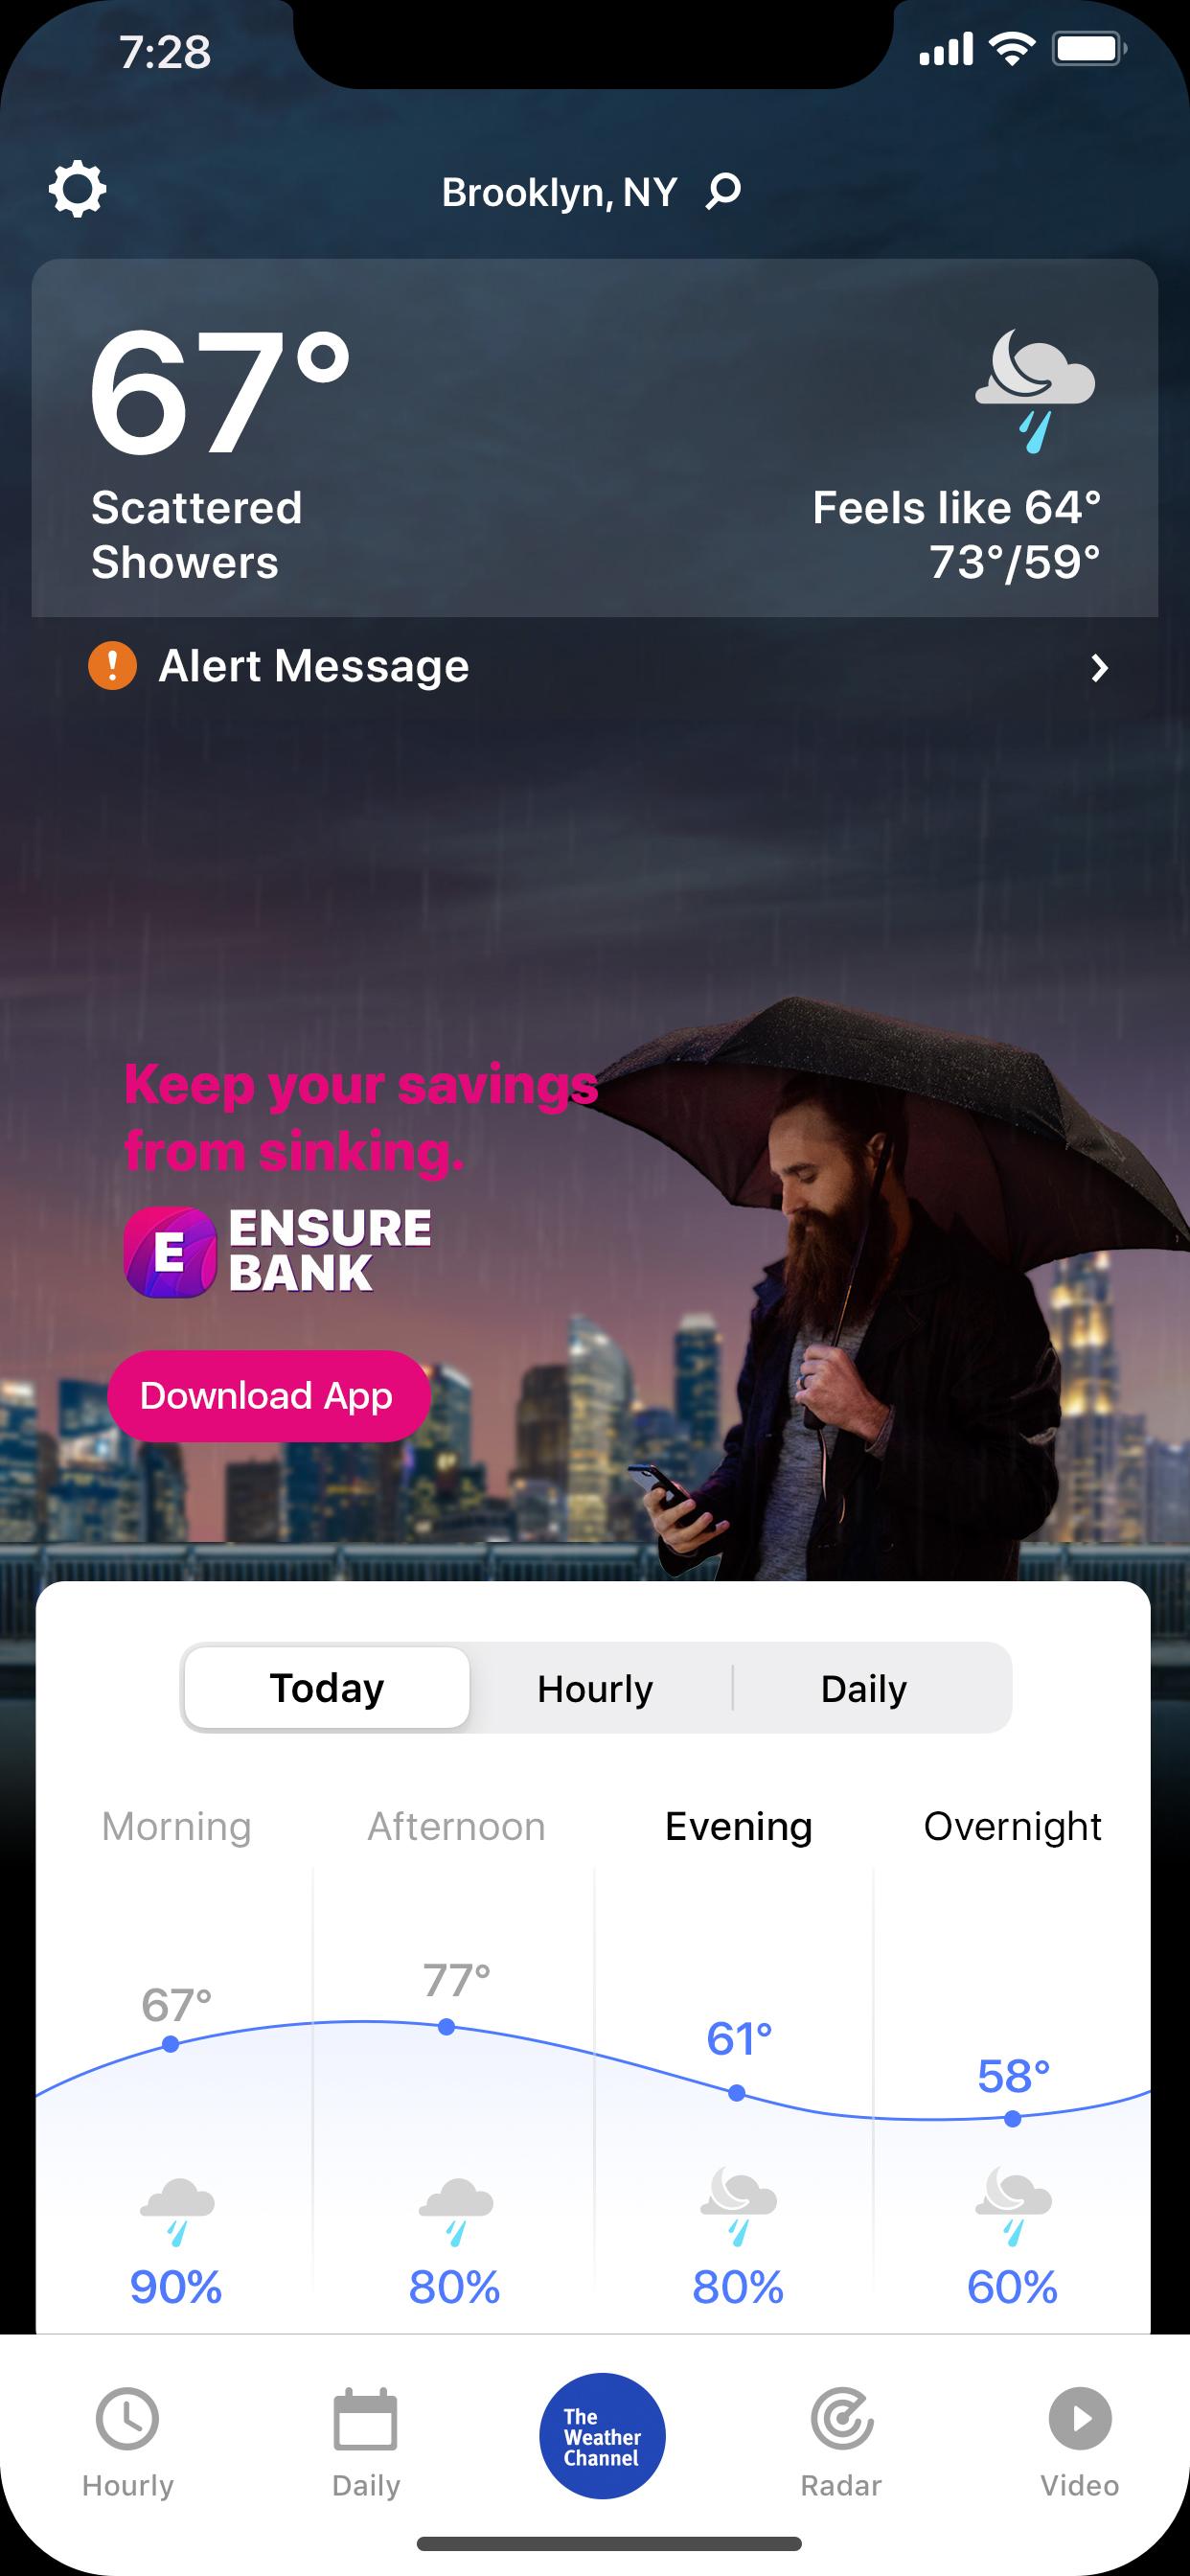 GenericBankApp_Mobile_App-IM_NextGen-Mock__Rainy Night